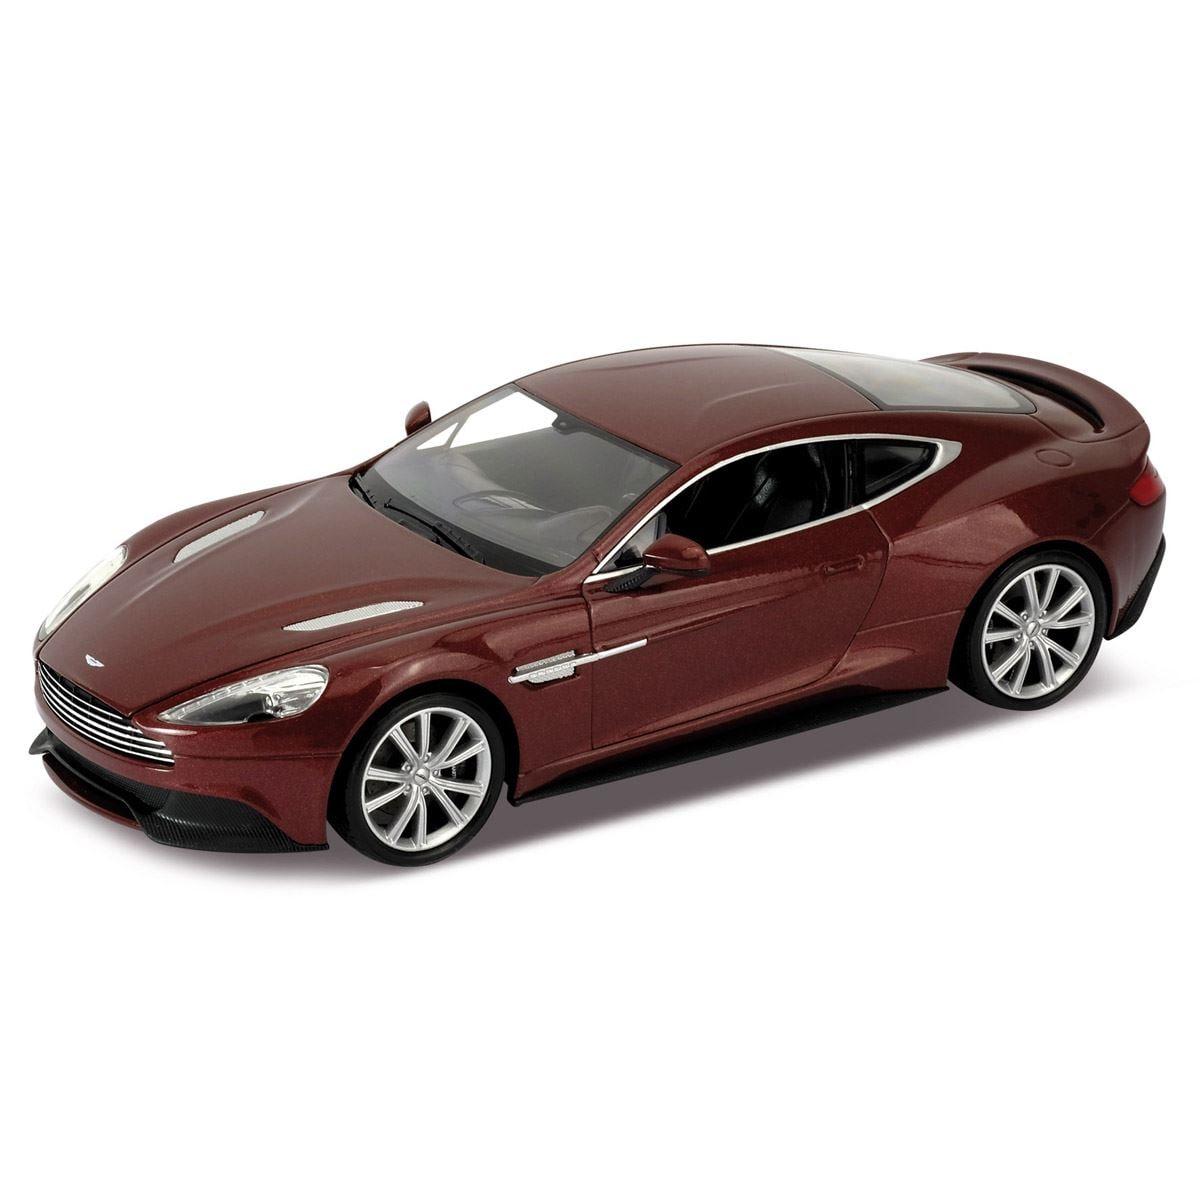 Aston Martin Vanquish Escala 1:24